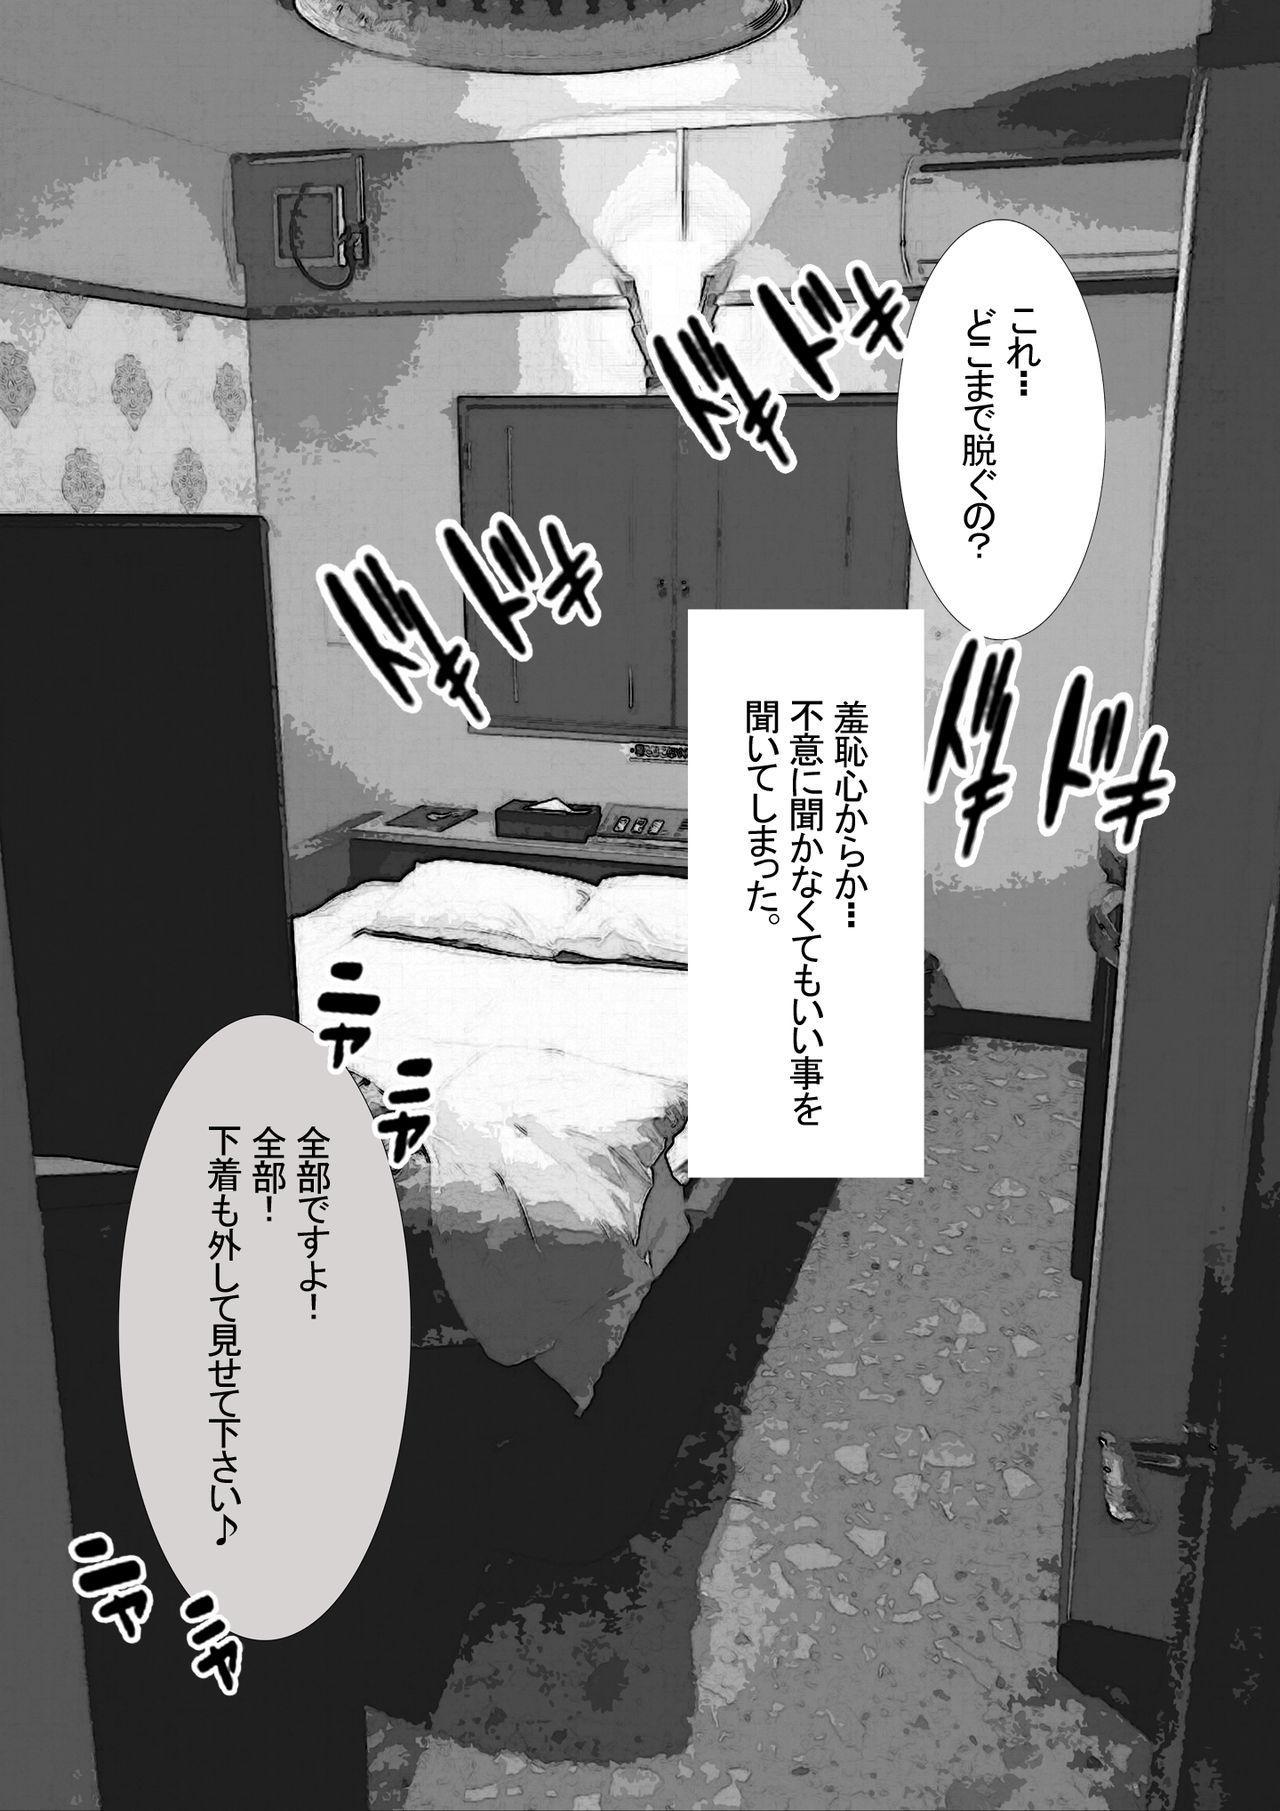 市ノ瀬美加子の場合 37